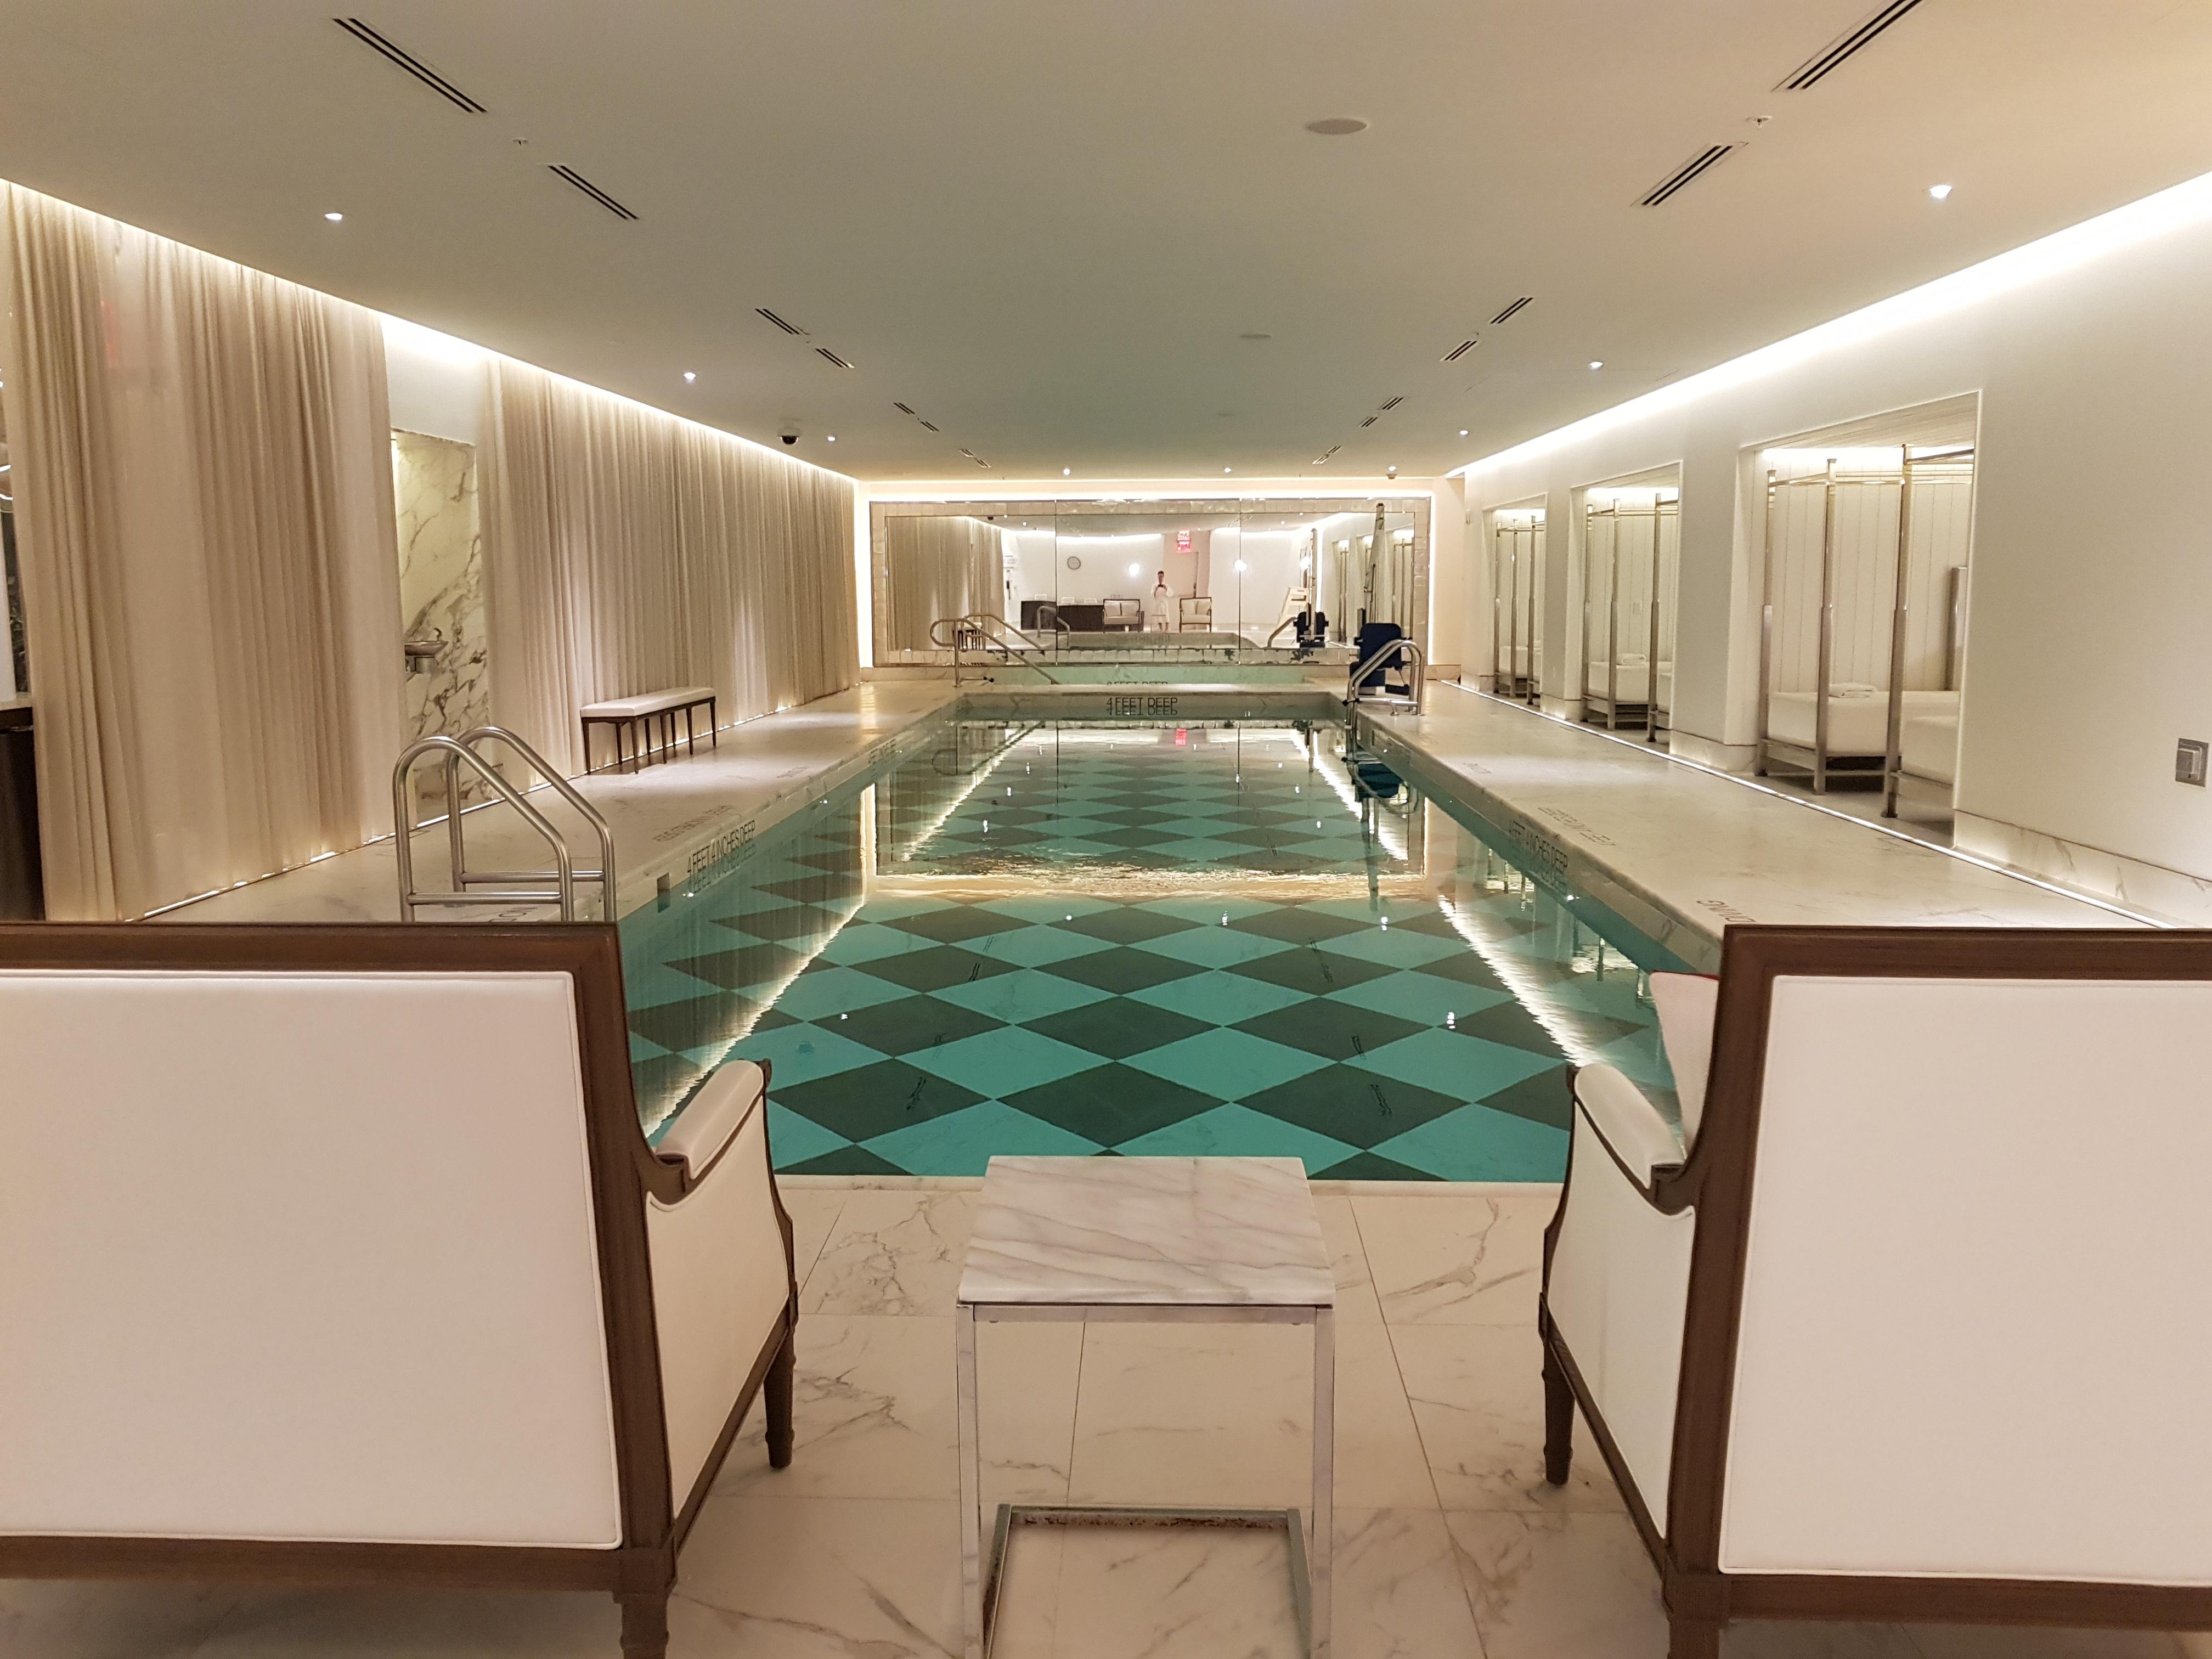 design inspiration interior spa plans ideas